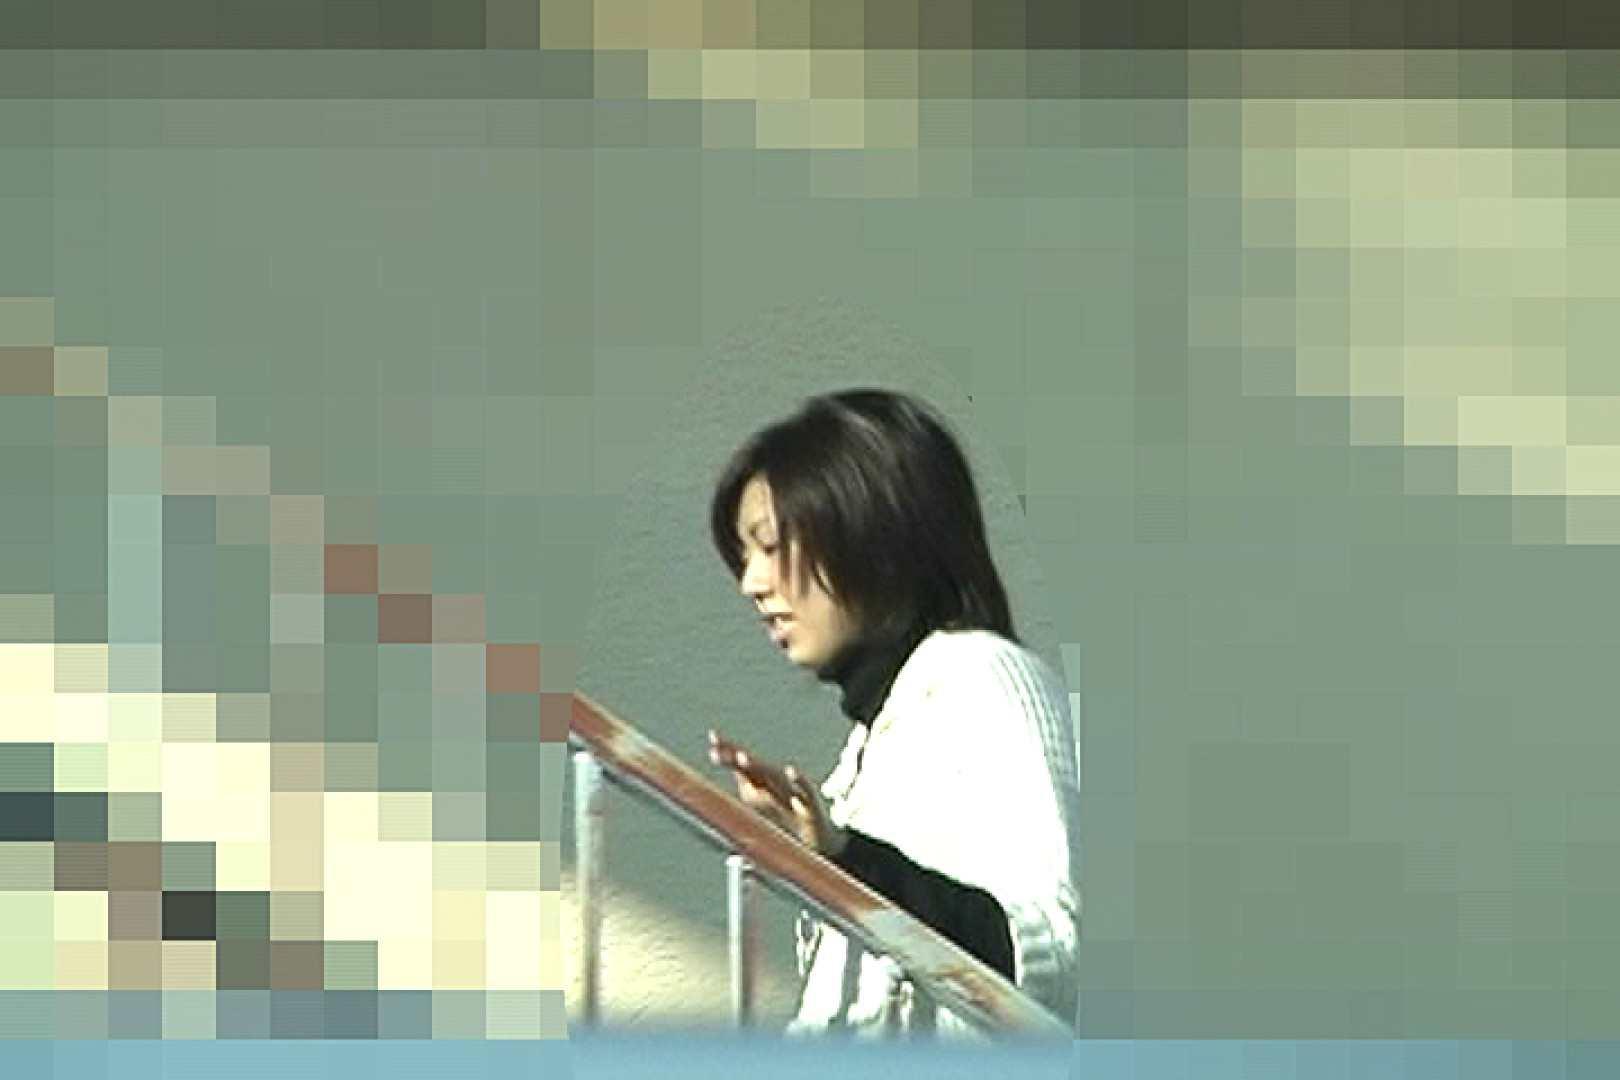 Aquaな露天風呂Vol.25 美しいOLの裸体 おまんこ無修正動画無料 72pic 2